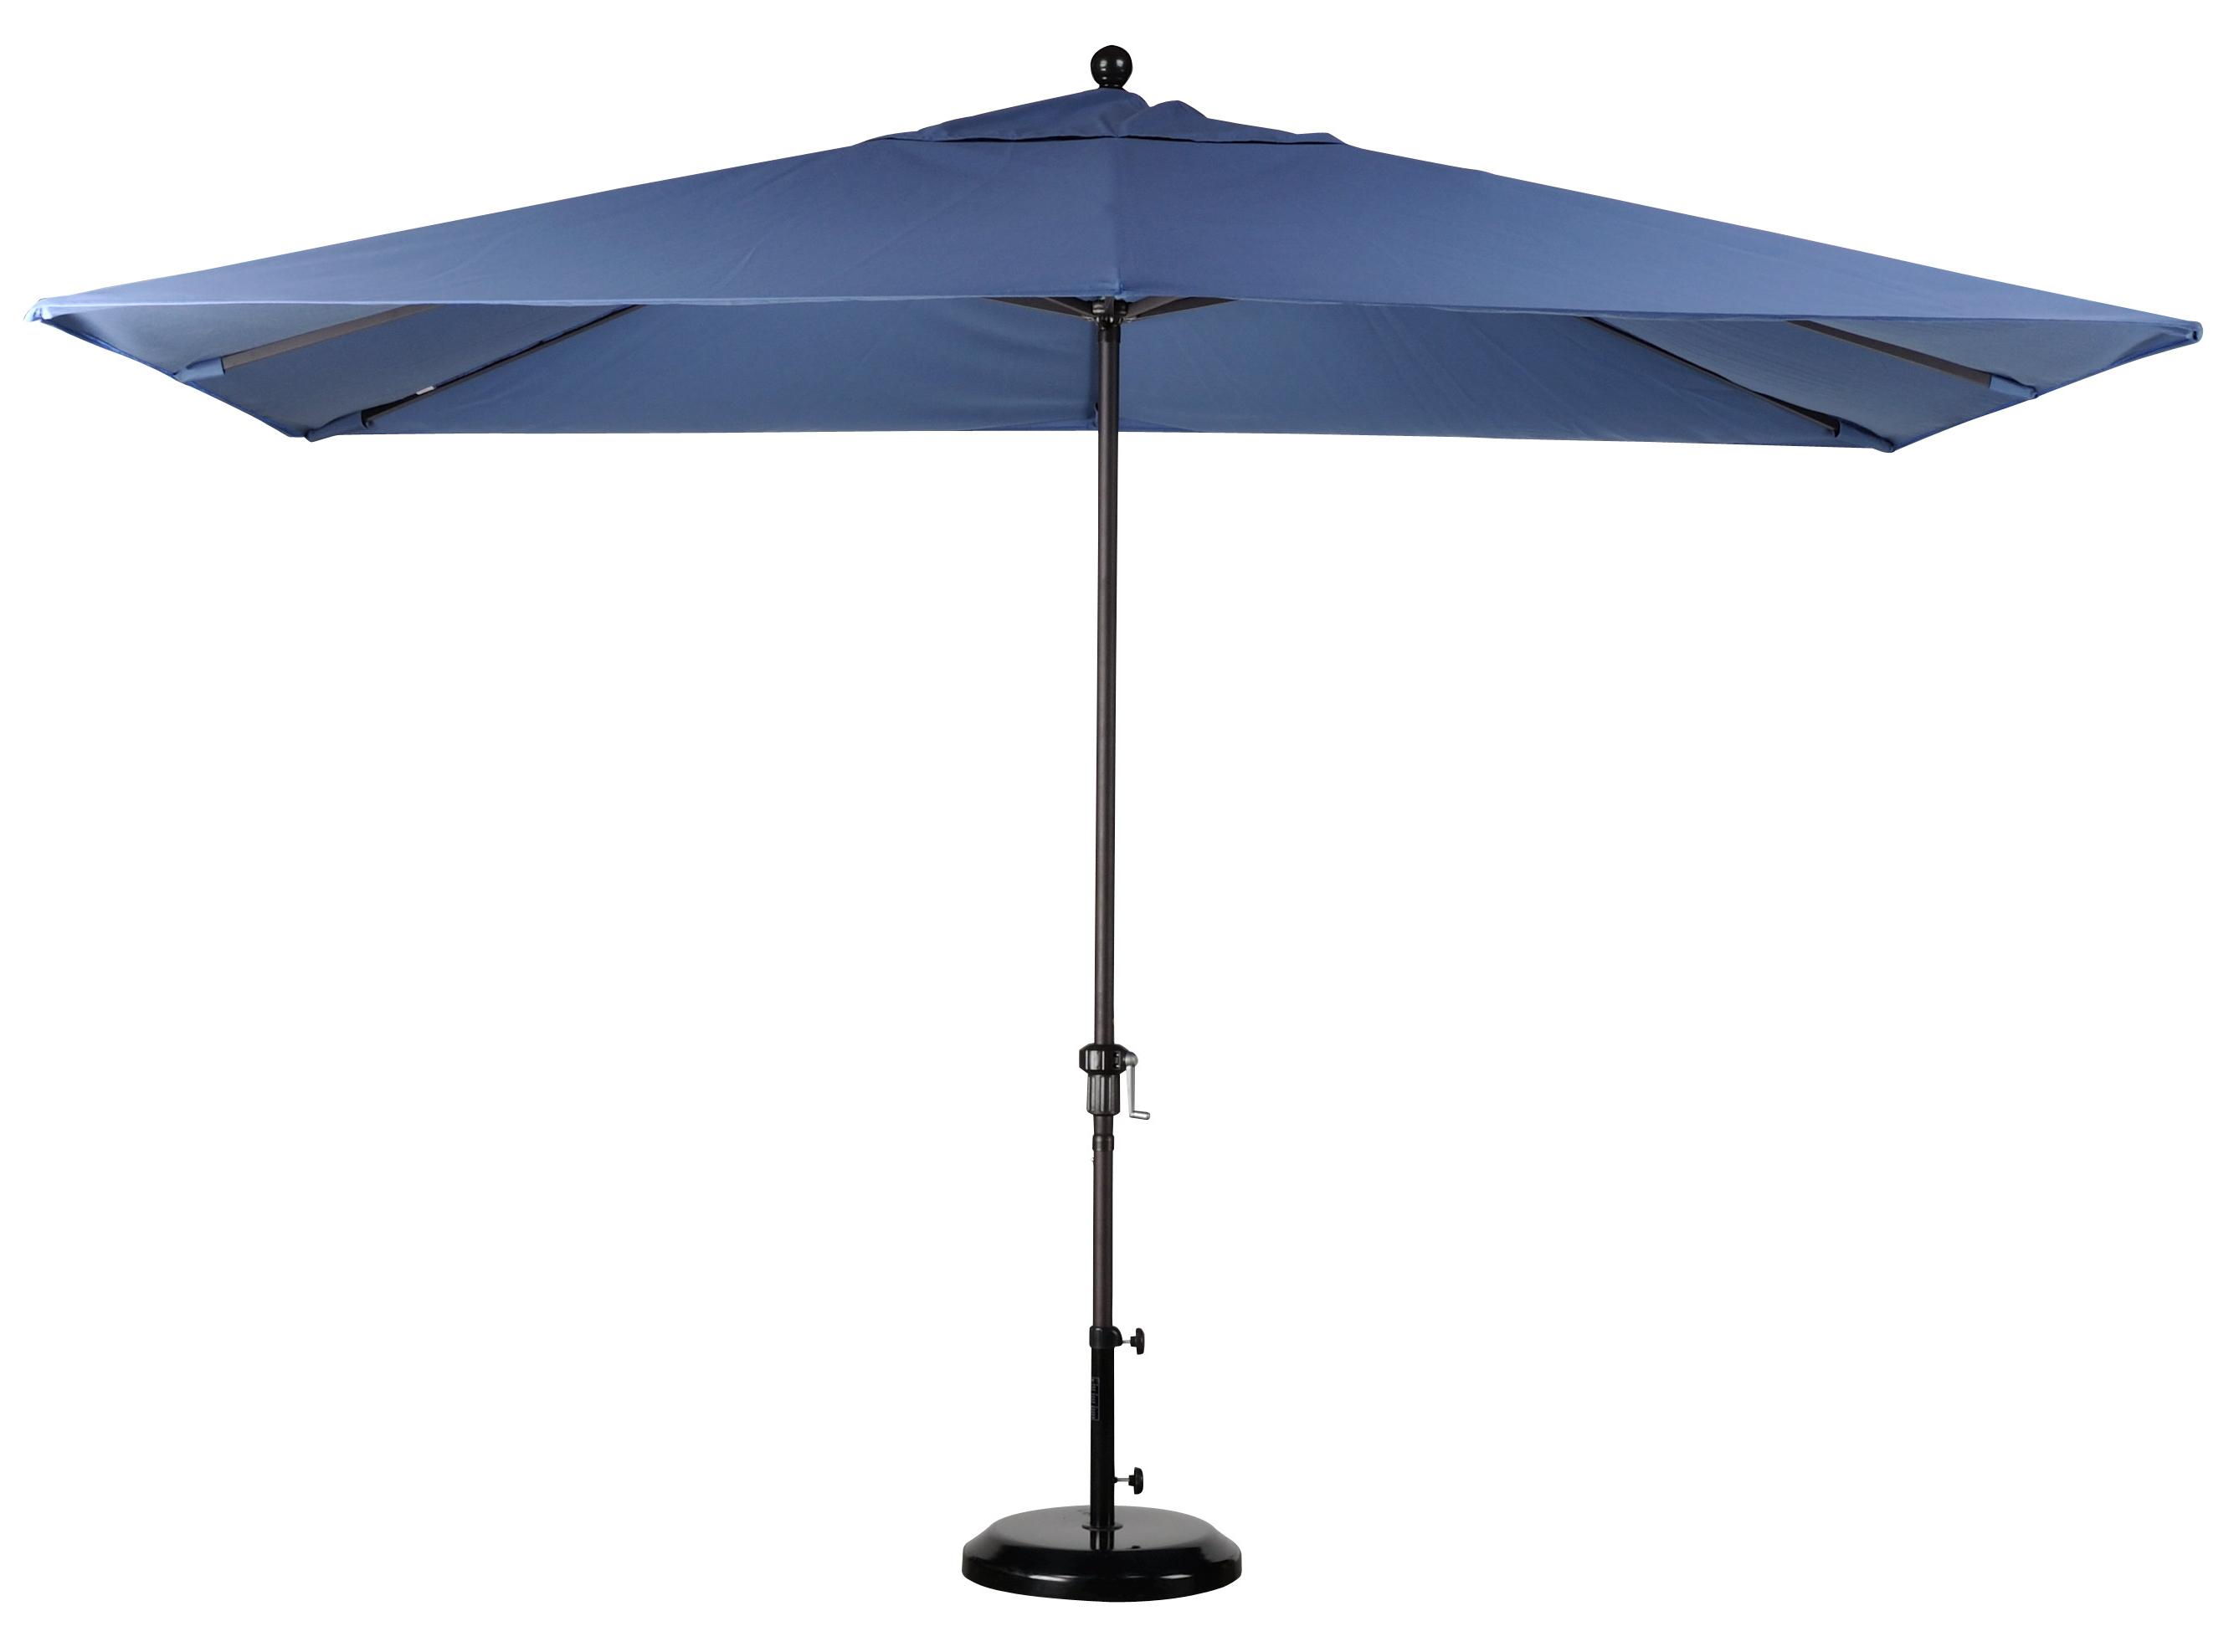 Solid Rectangular Market Umbrellas Intended For Popular Best Selection Rectangular Market Umbrellas – Featuring Sunbrella (View 12 of 20)